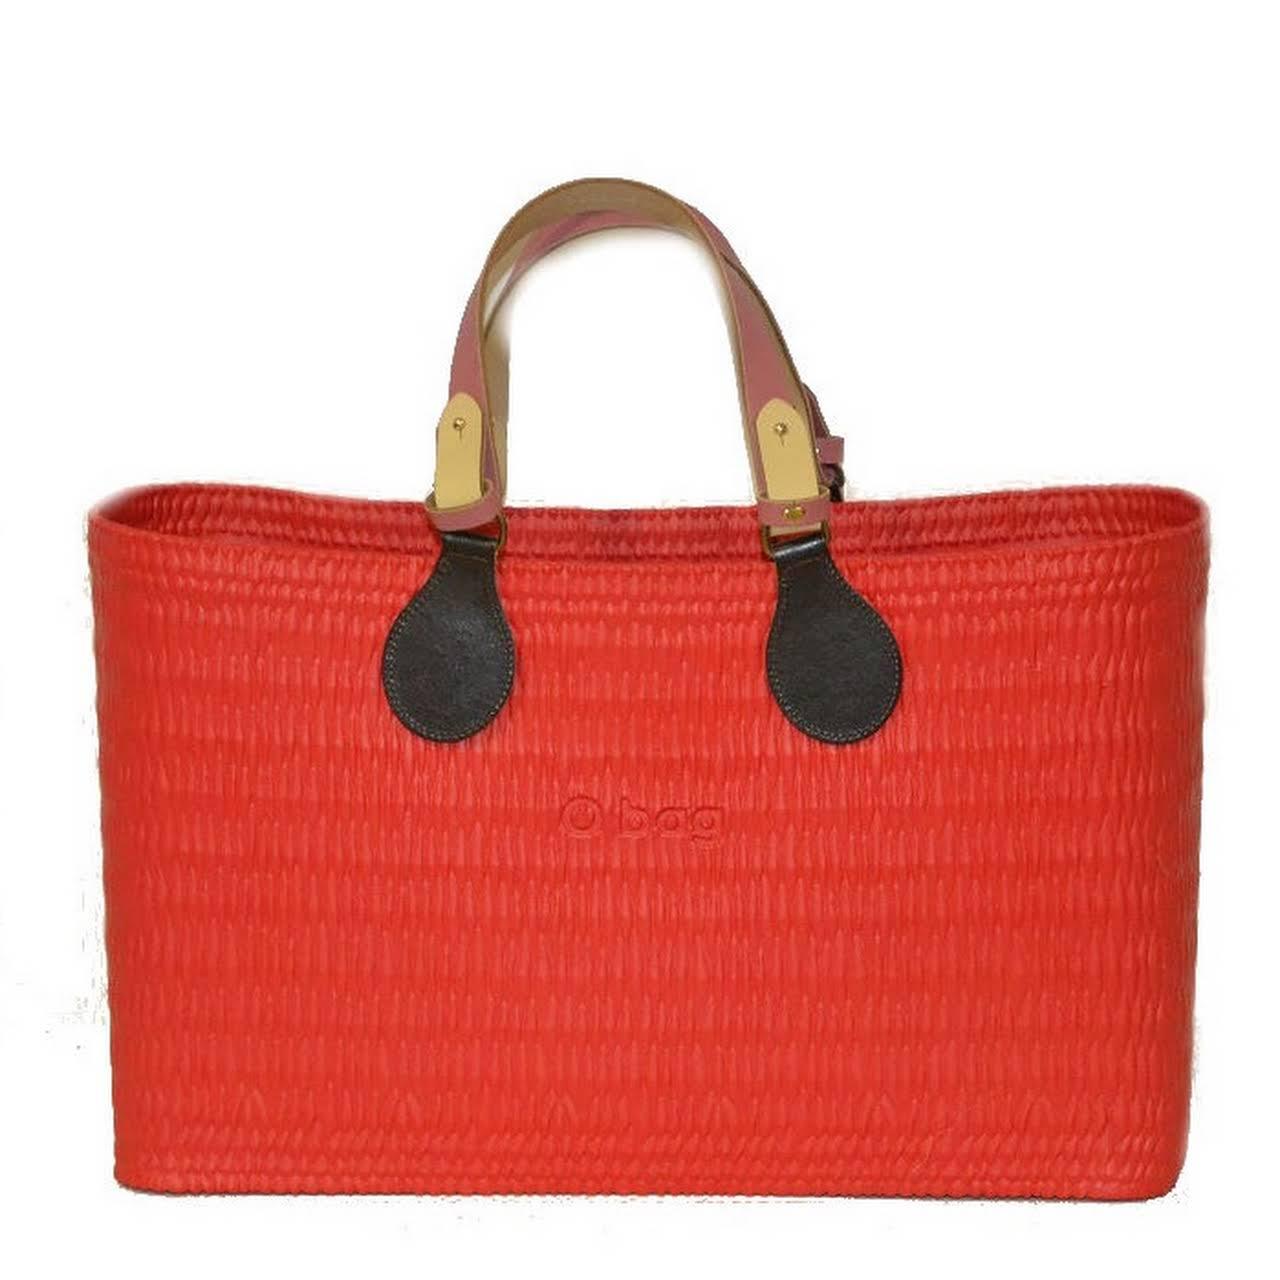 3157421a3a O beach borsa O bag mare rossa con manici e sacca